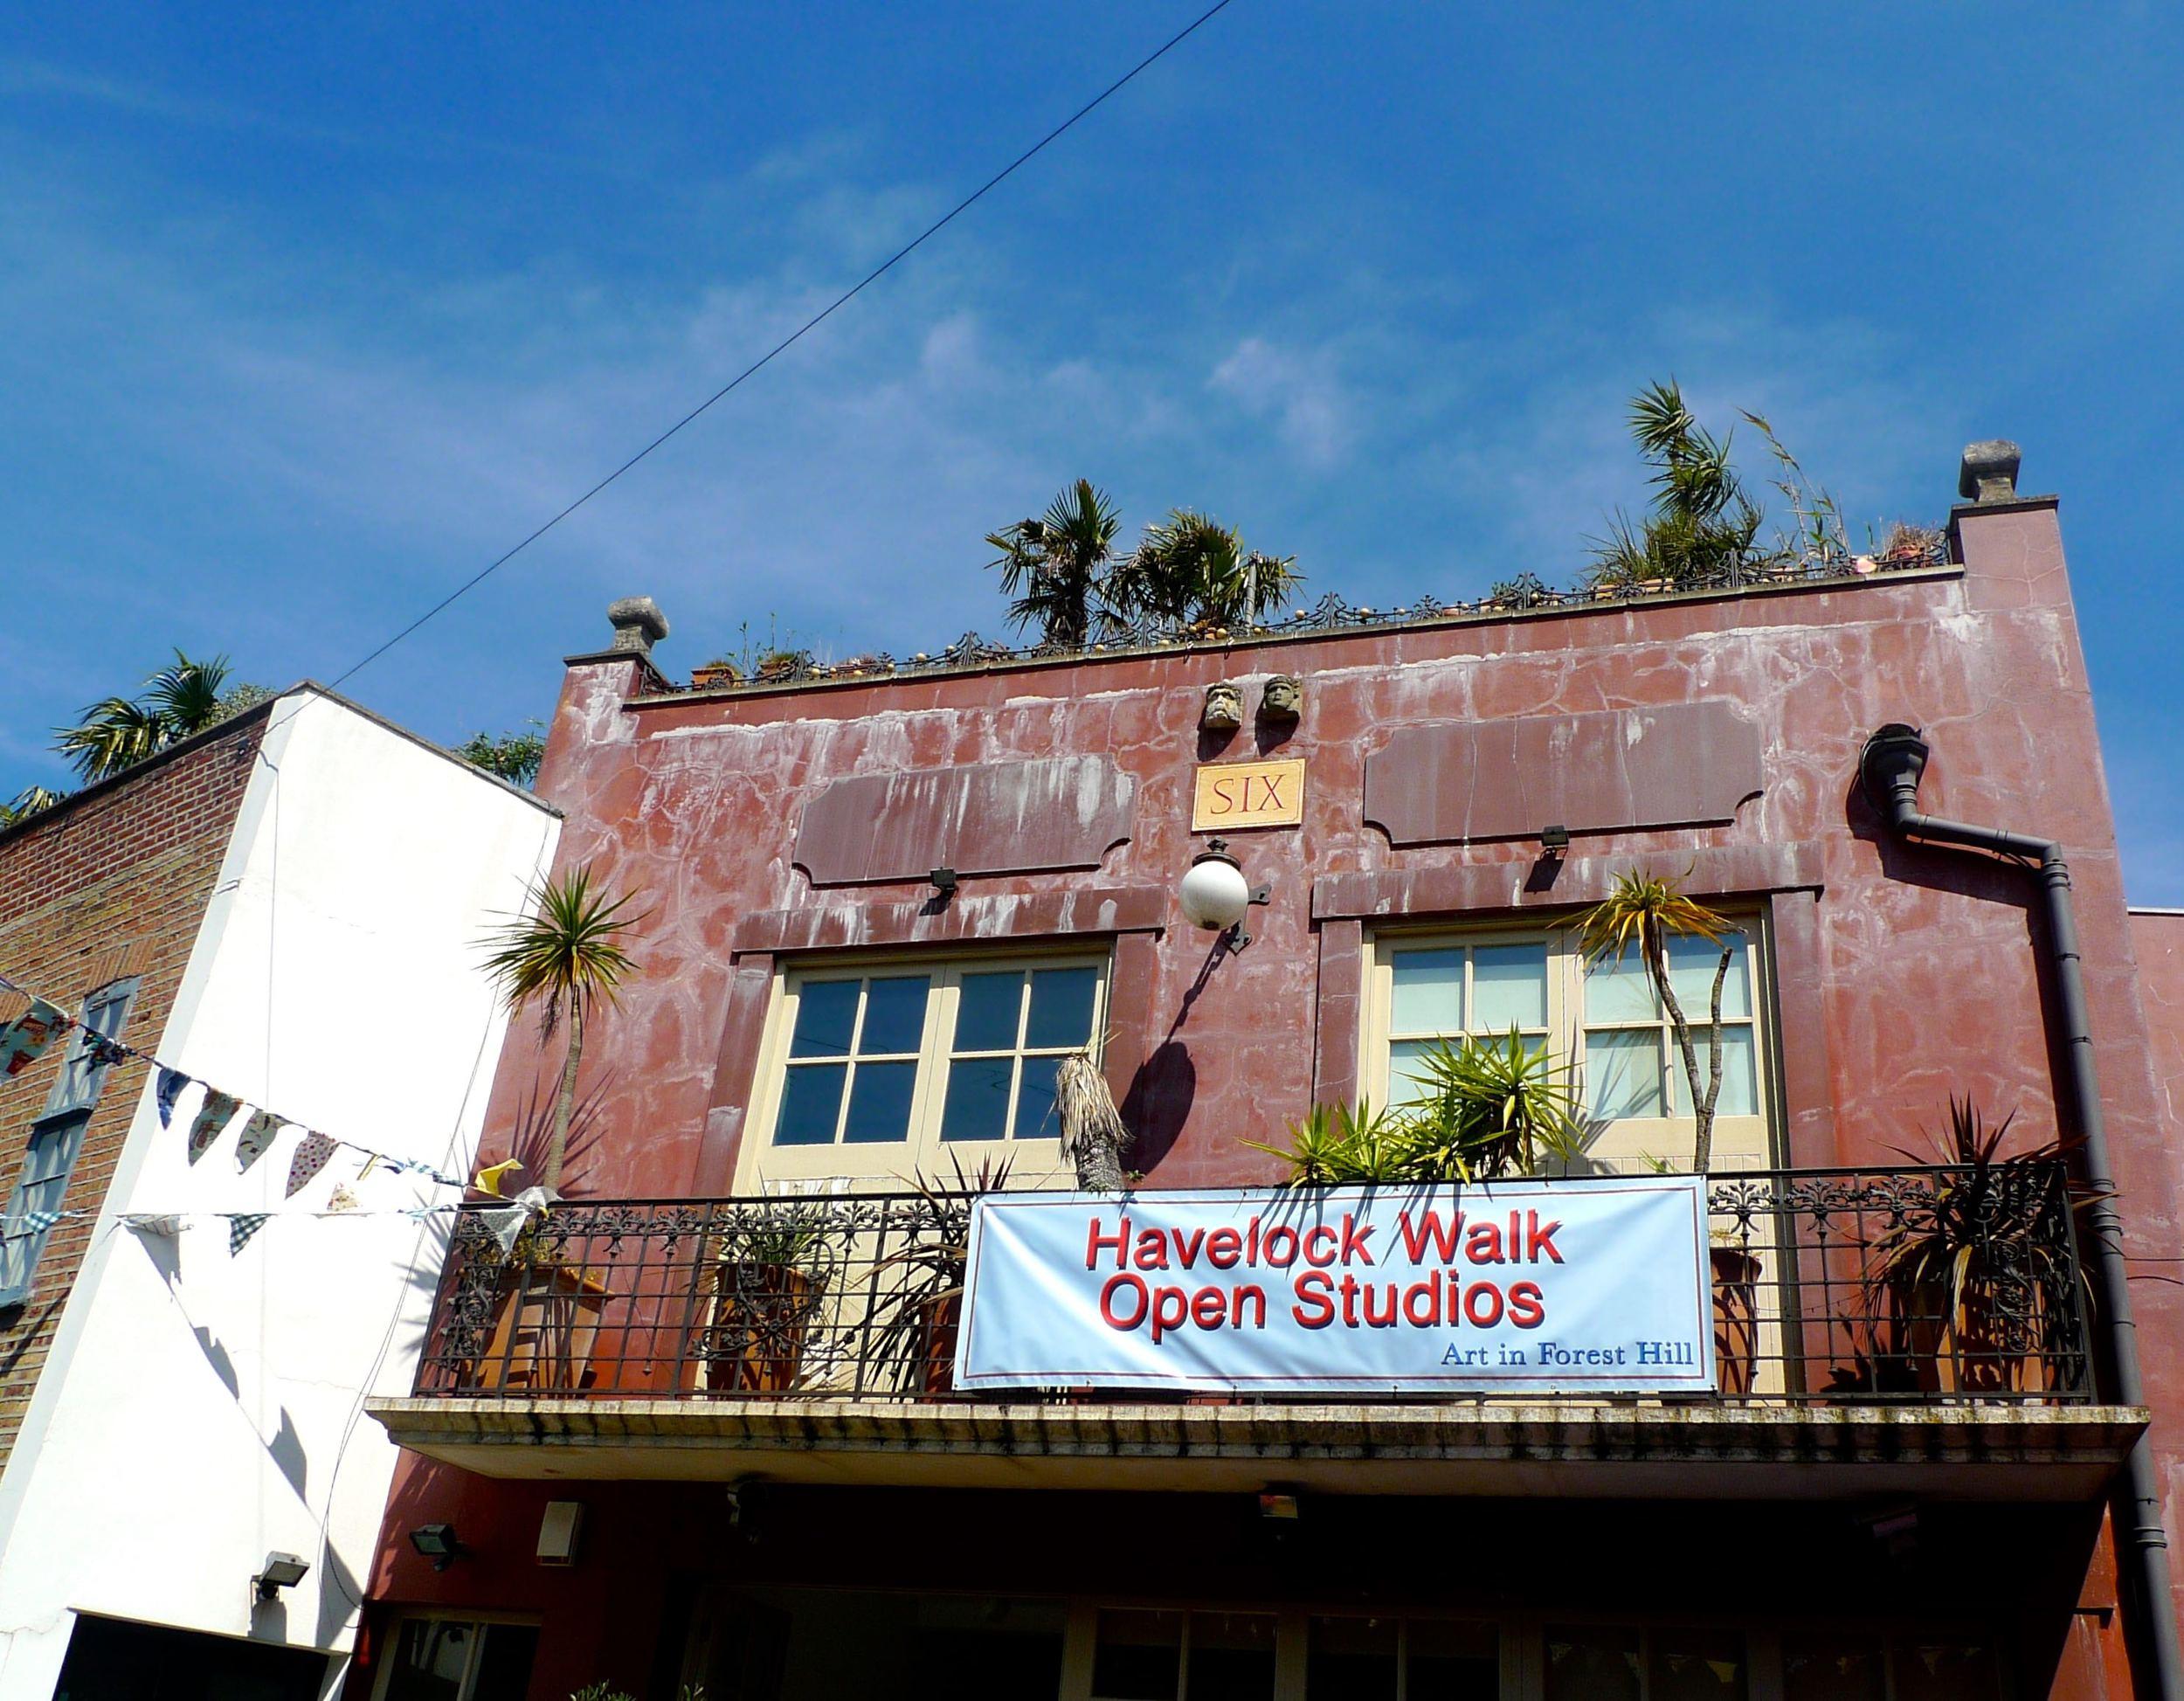 havelock walk open studios forest hill